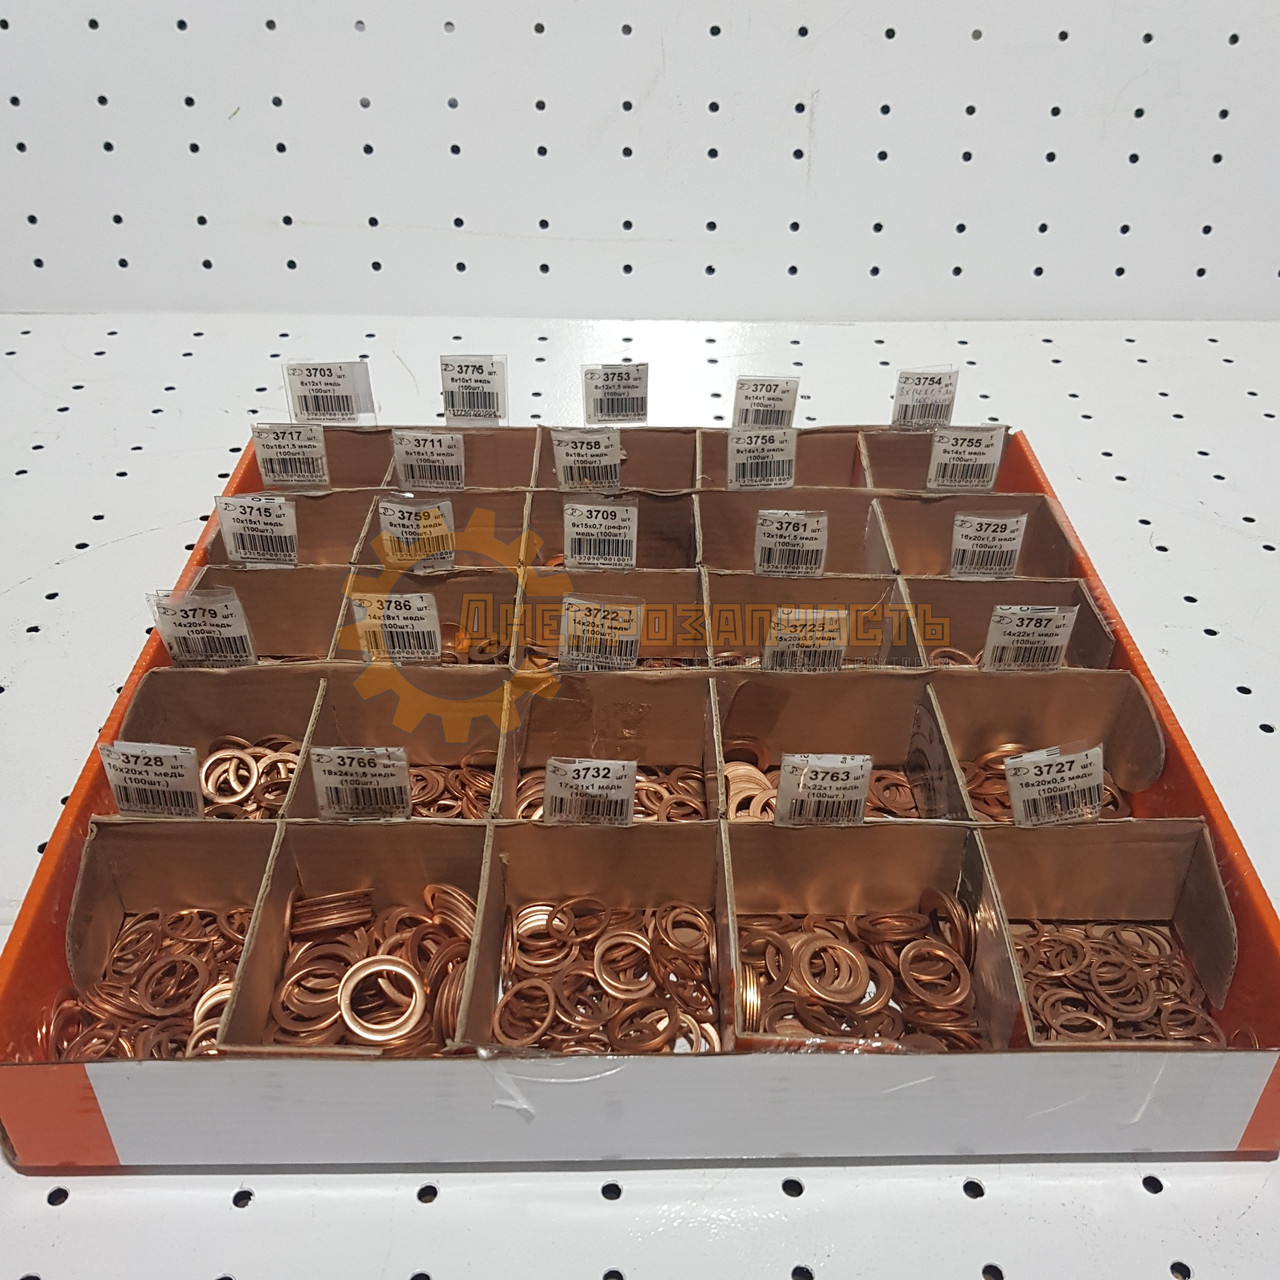 Шайба (кольцо) алюминиевая 20x32x1,5